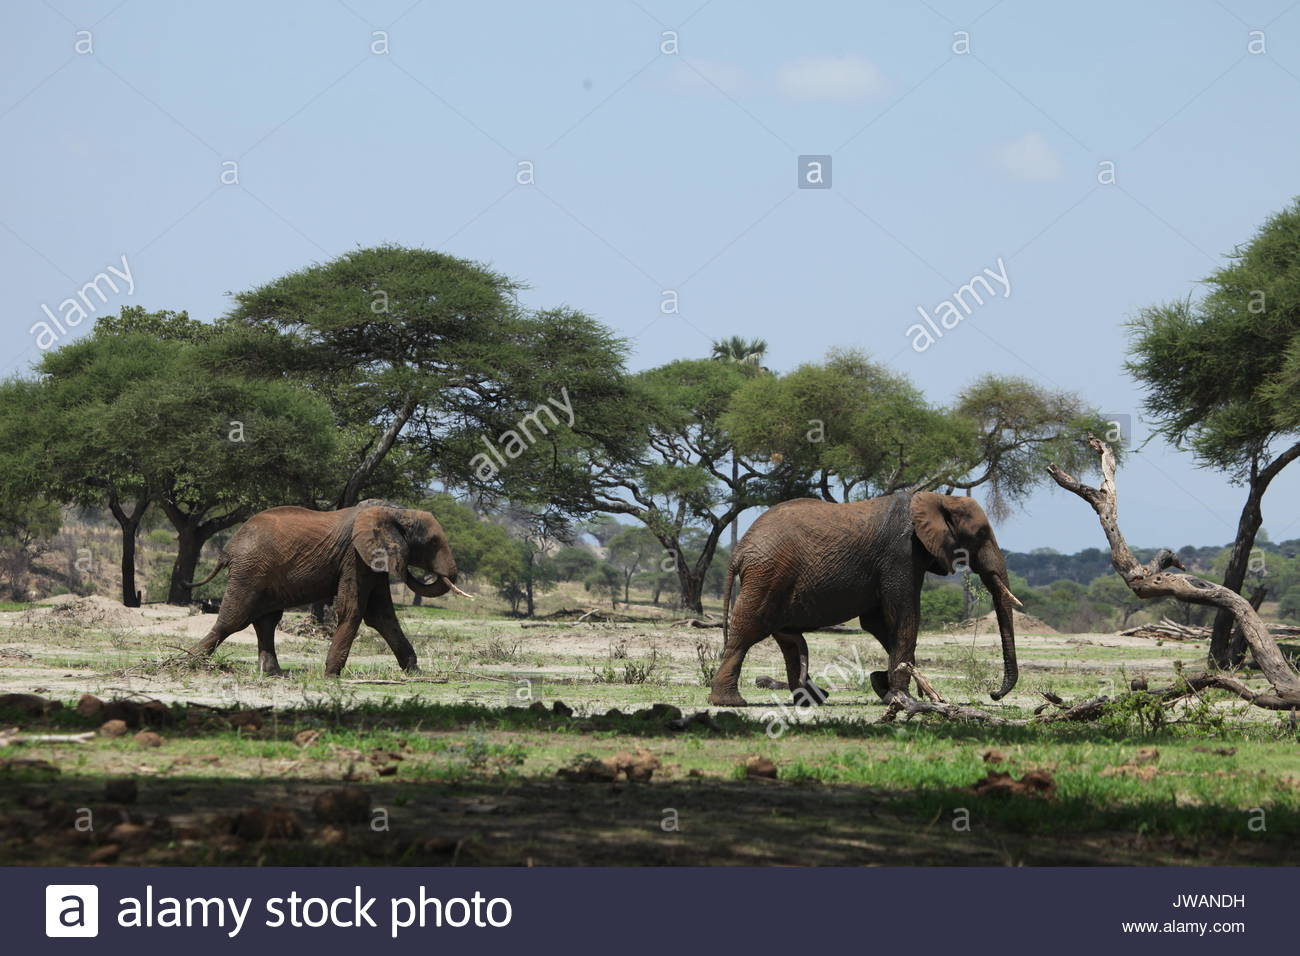 African elephants in Serengeti National Park. - Stock Image